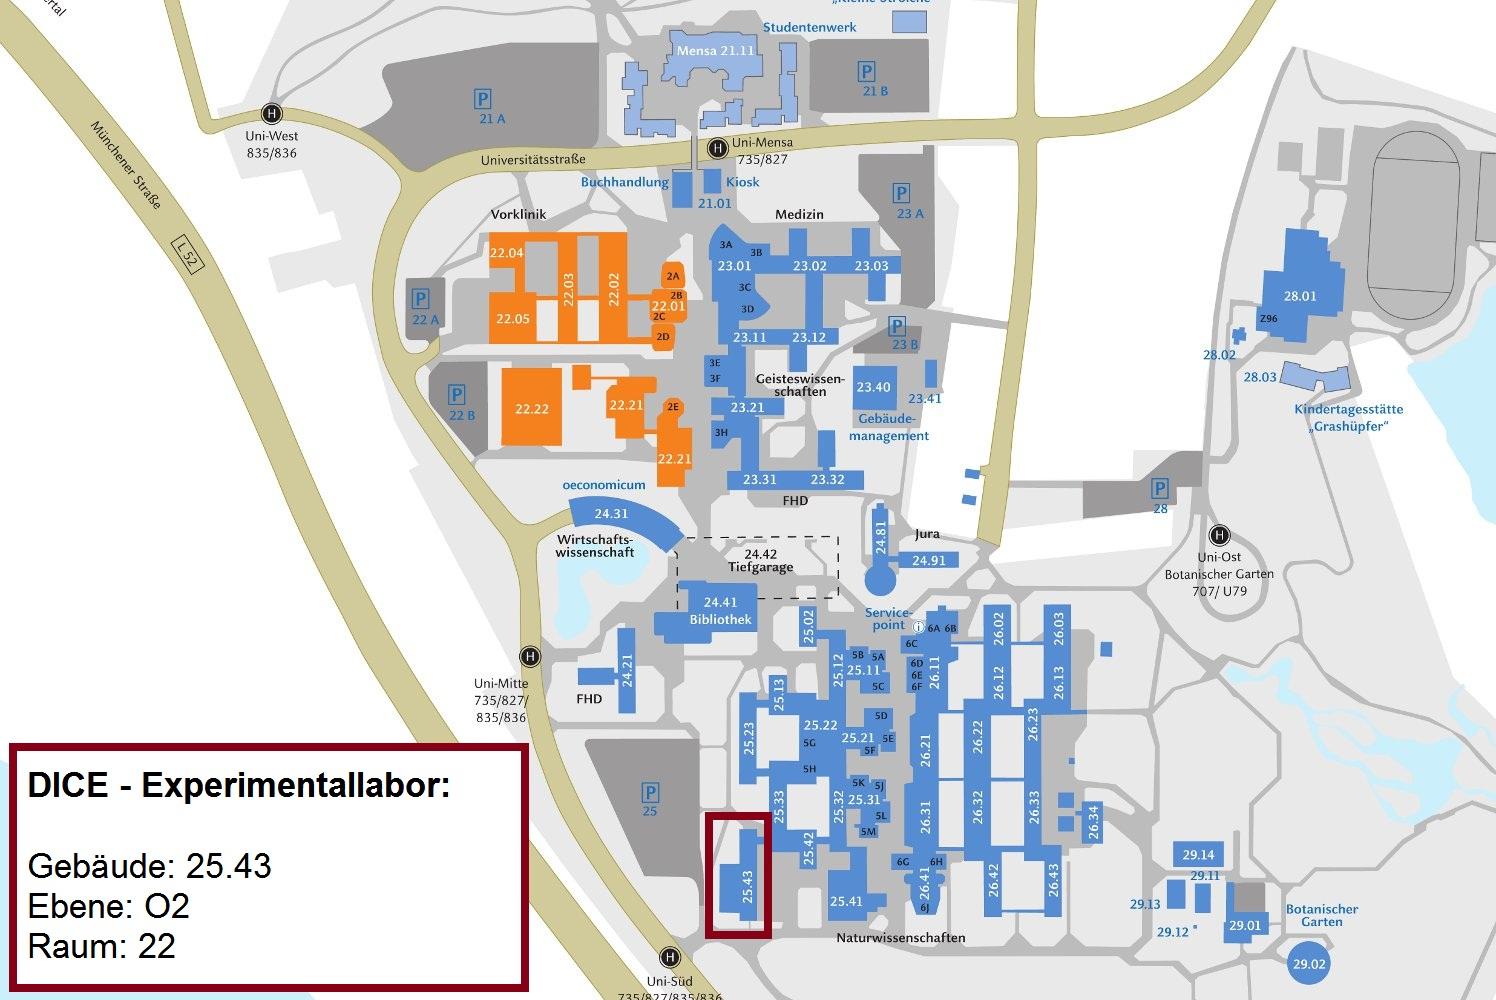 universitt dsseldorf dice labor - Uni Dsseldorf Bewerbung